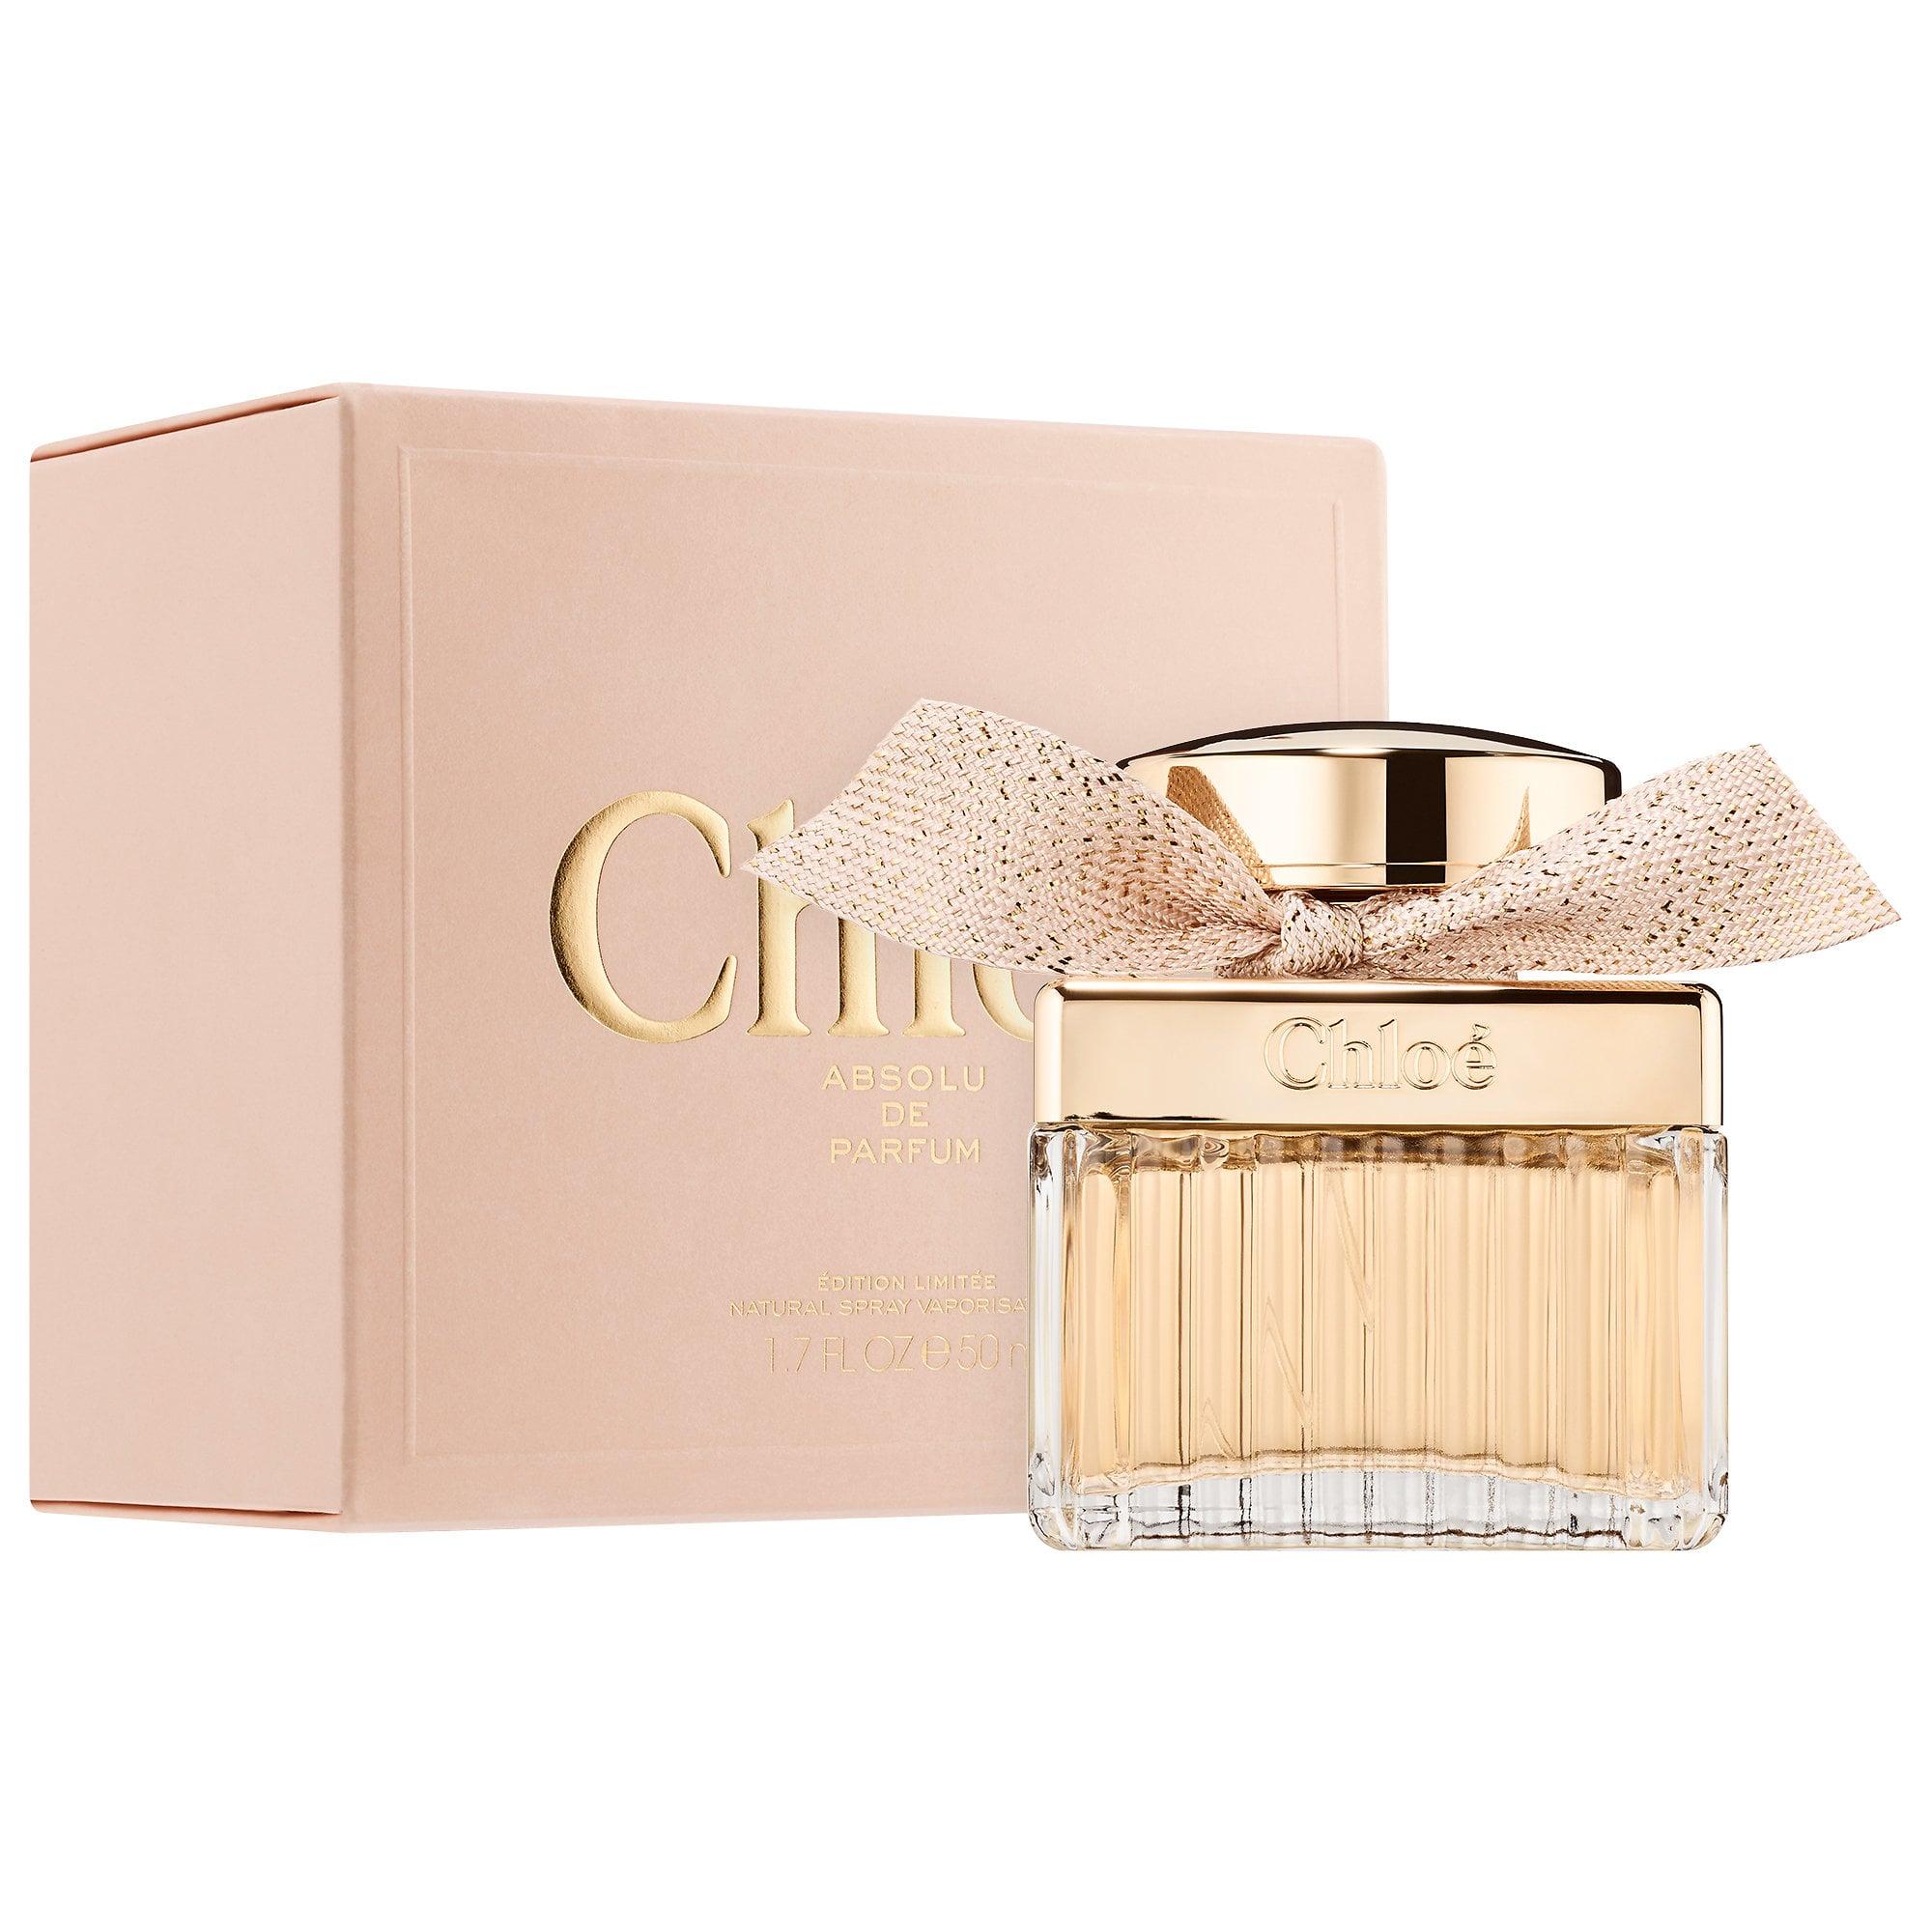 De Chloé Absolu 1 Eau Oz Parfum 50 Spray 7 Ml XOPk8wn0